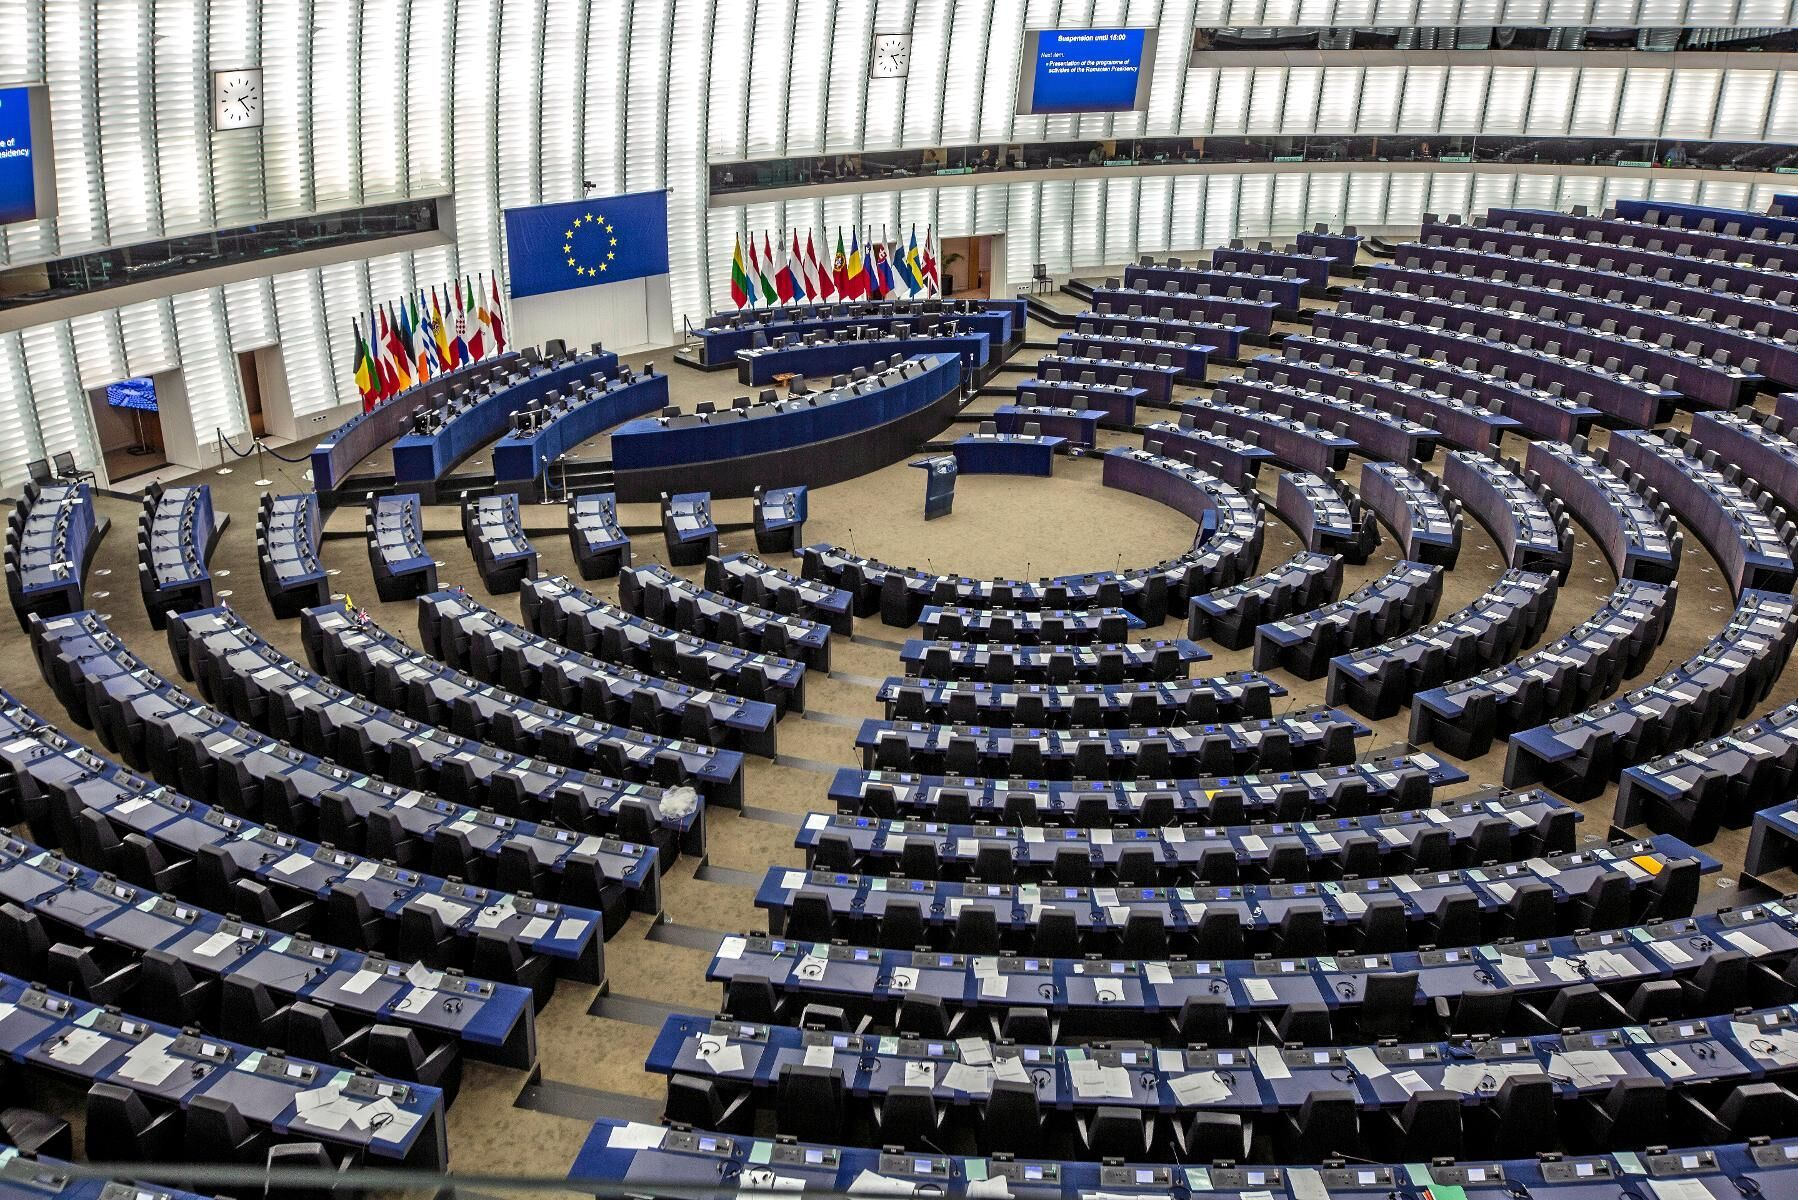 I dag har nio svenska partier 20 stolar i plenisalen i EU-parlamentet i Strasbourg.